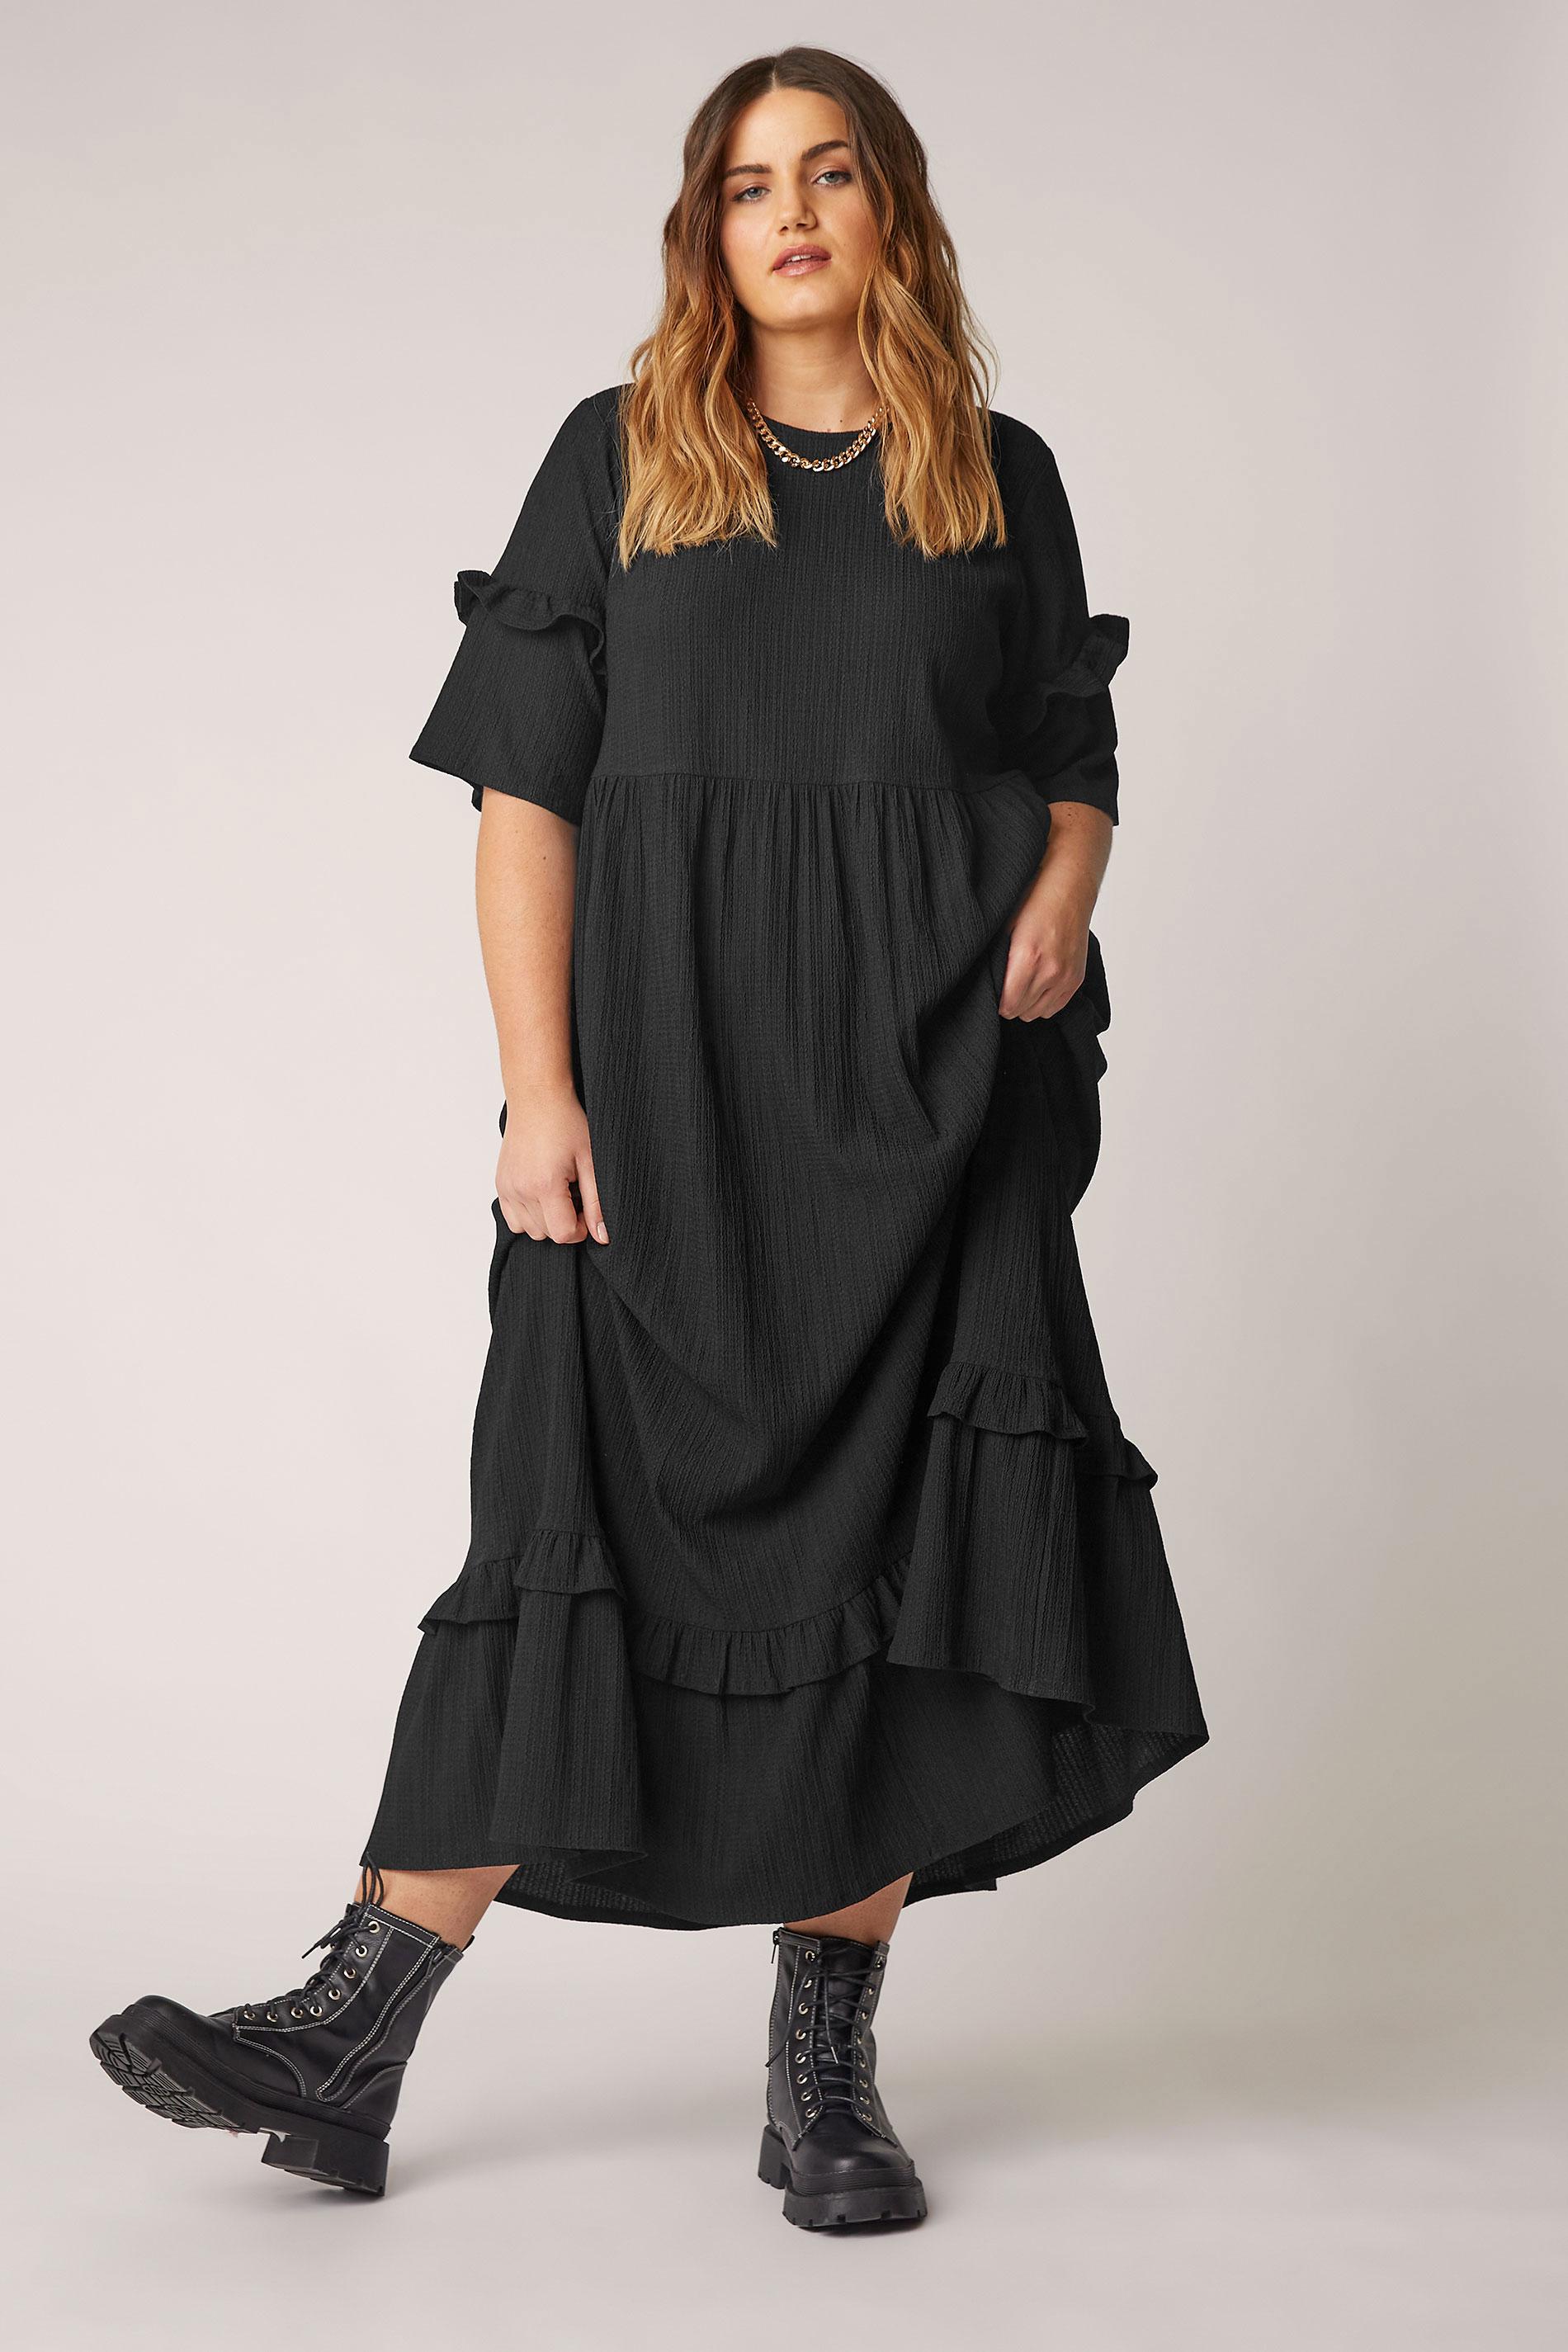 THE LIMITED EDIT Black Smock Midaxi Dress_A.jpg